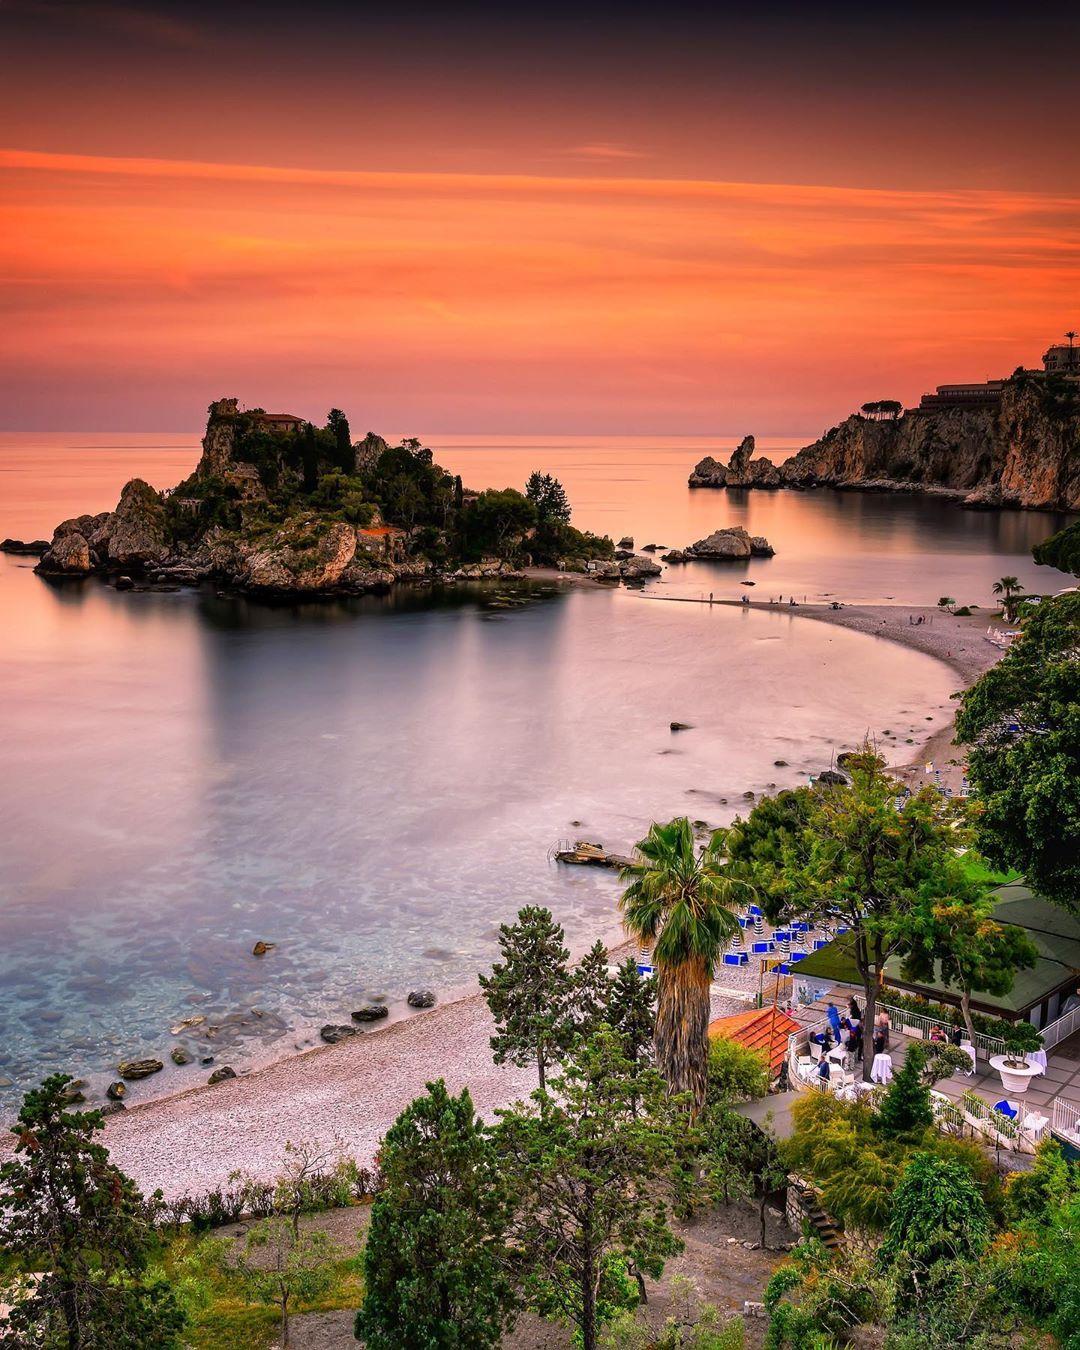 Pin by Dara Inman on Incredible Italy Italy beaches